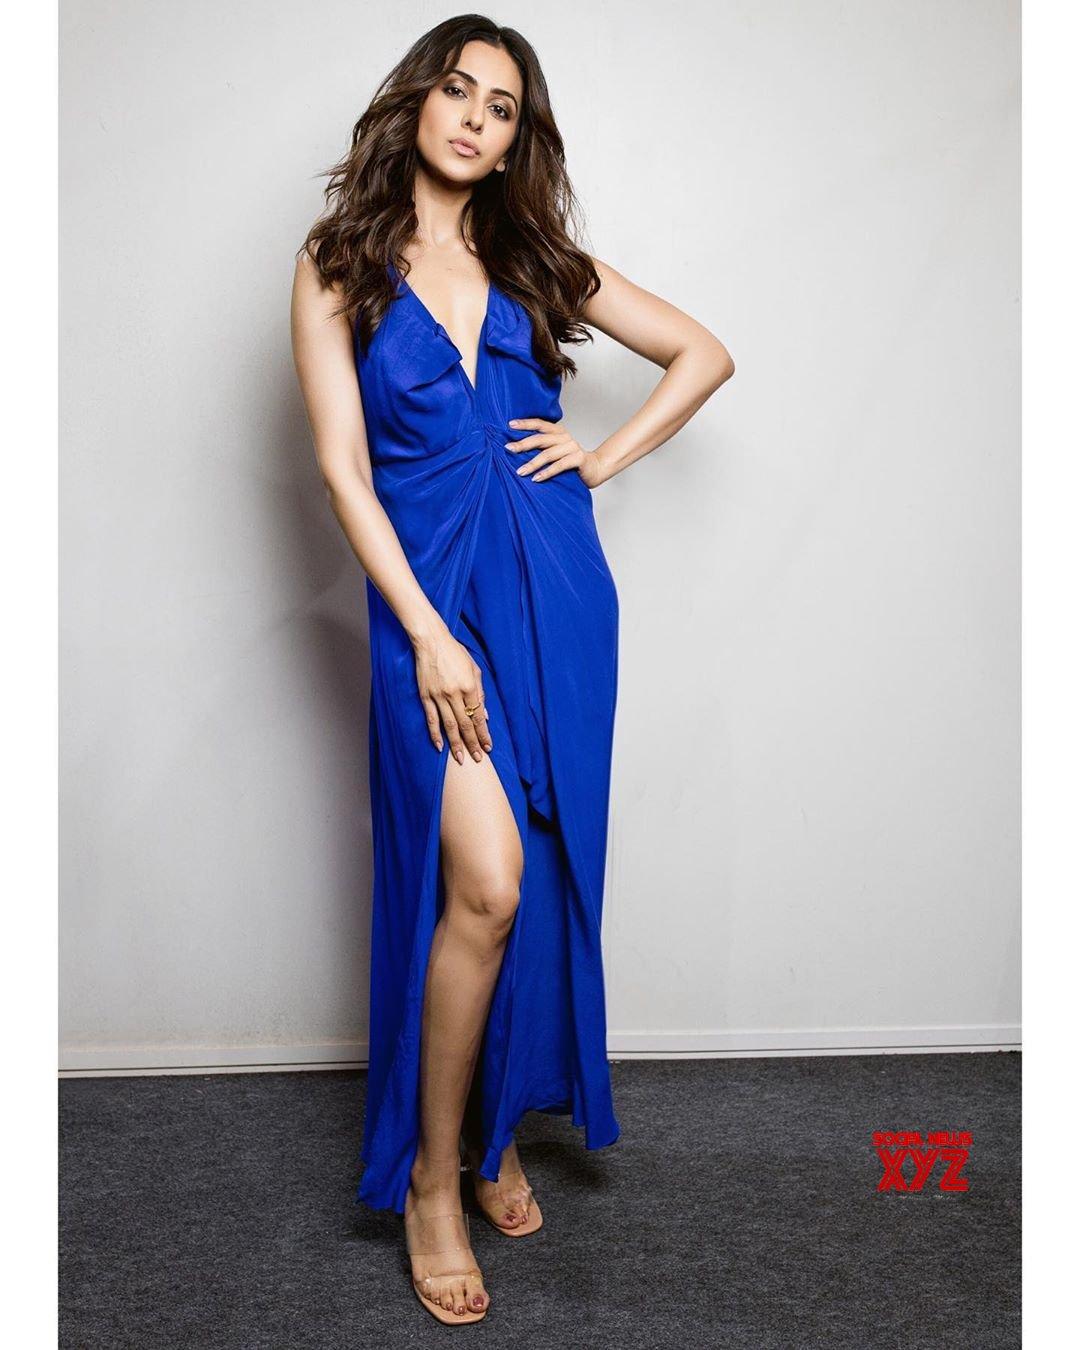 Actress Rakul Preet Singh Hot Glam Stills From Daniel Wellington Event